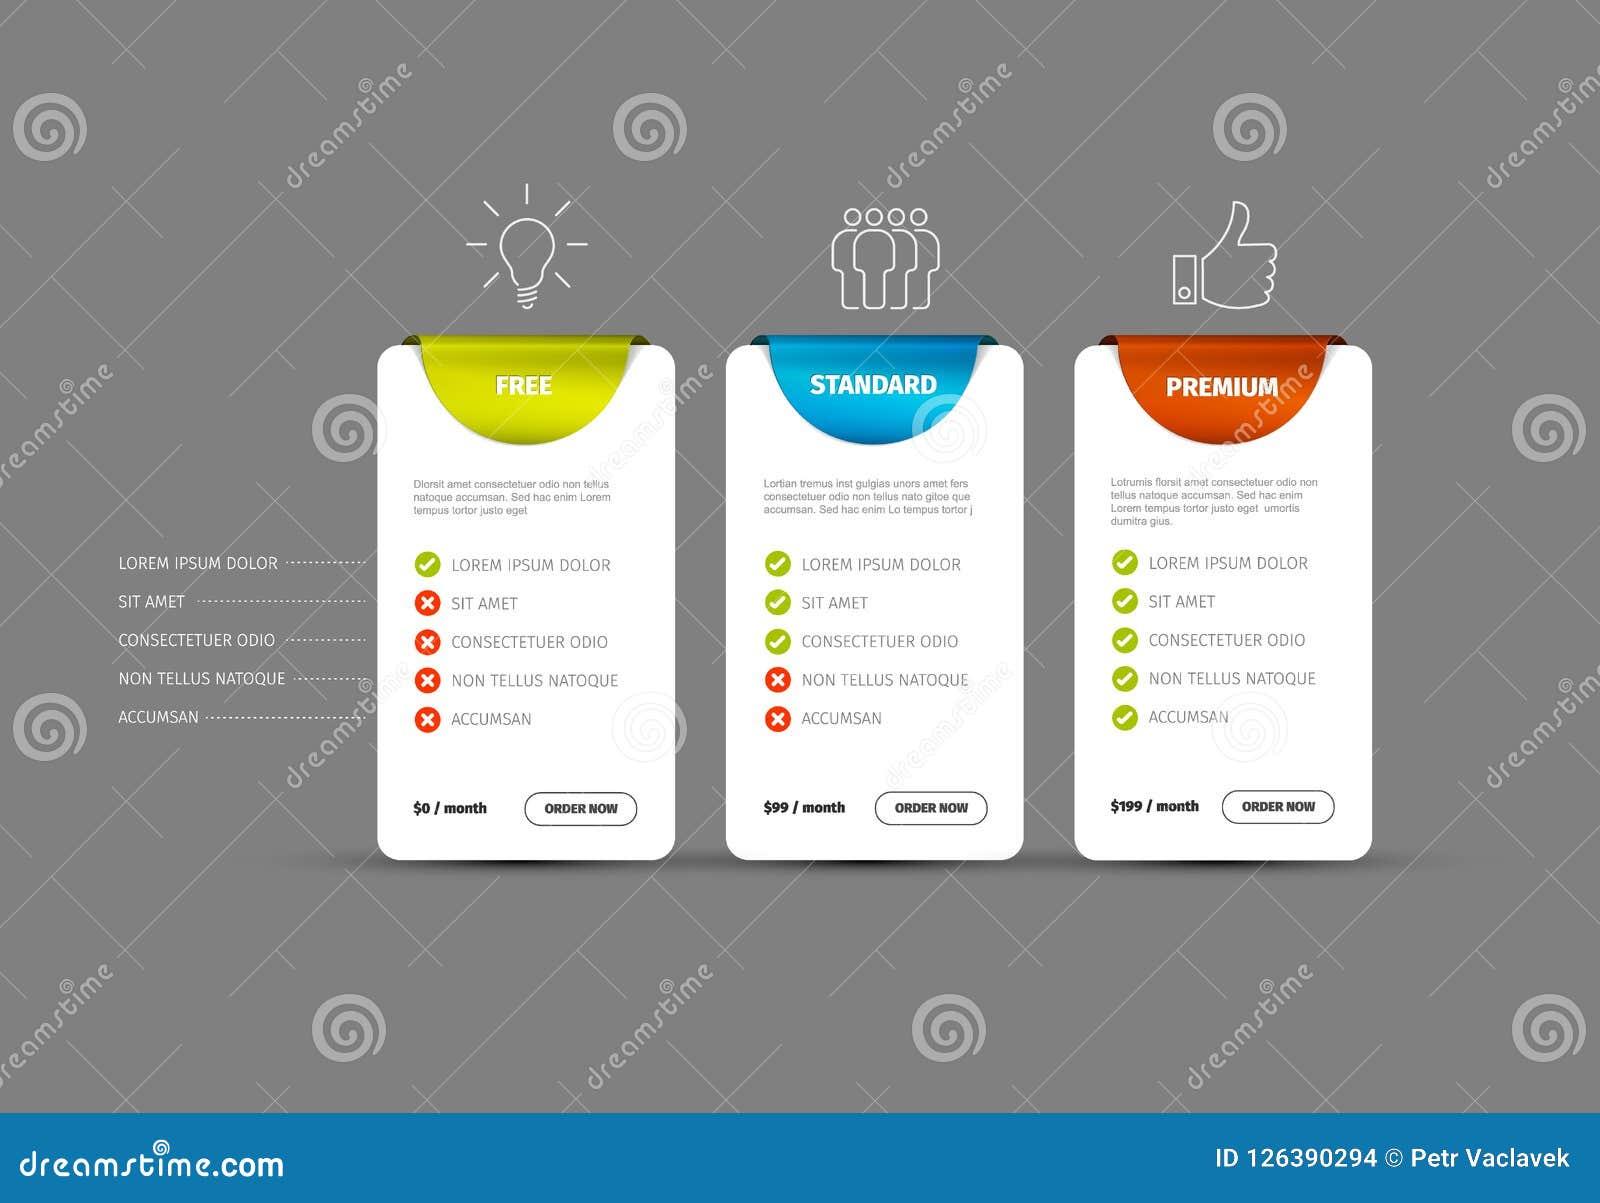 product service price comparison table stock vector illustration